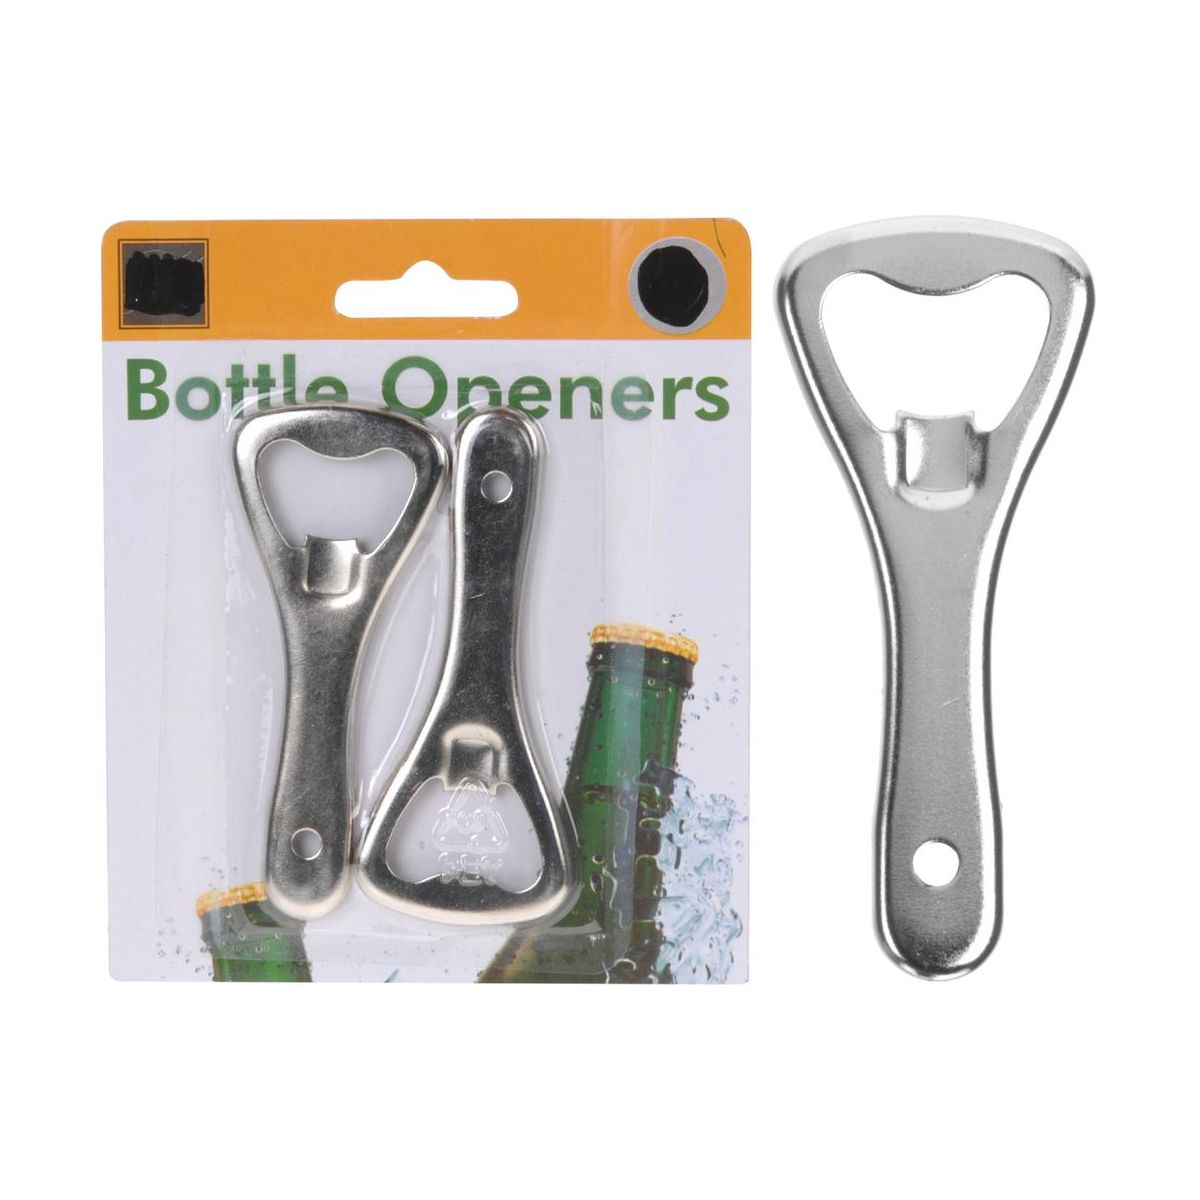 Набор открывалок для бутылок, 2 шт.открывалка для бутылок, 2 шт<br>